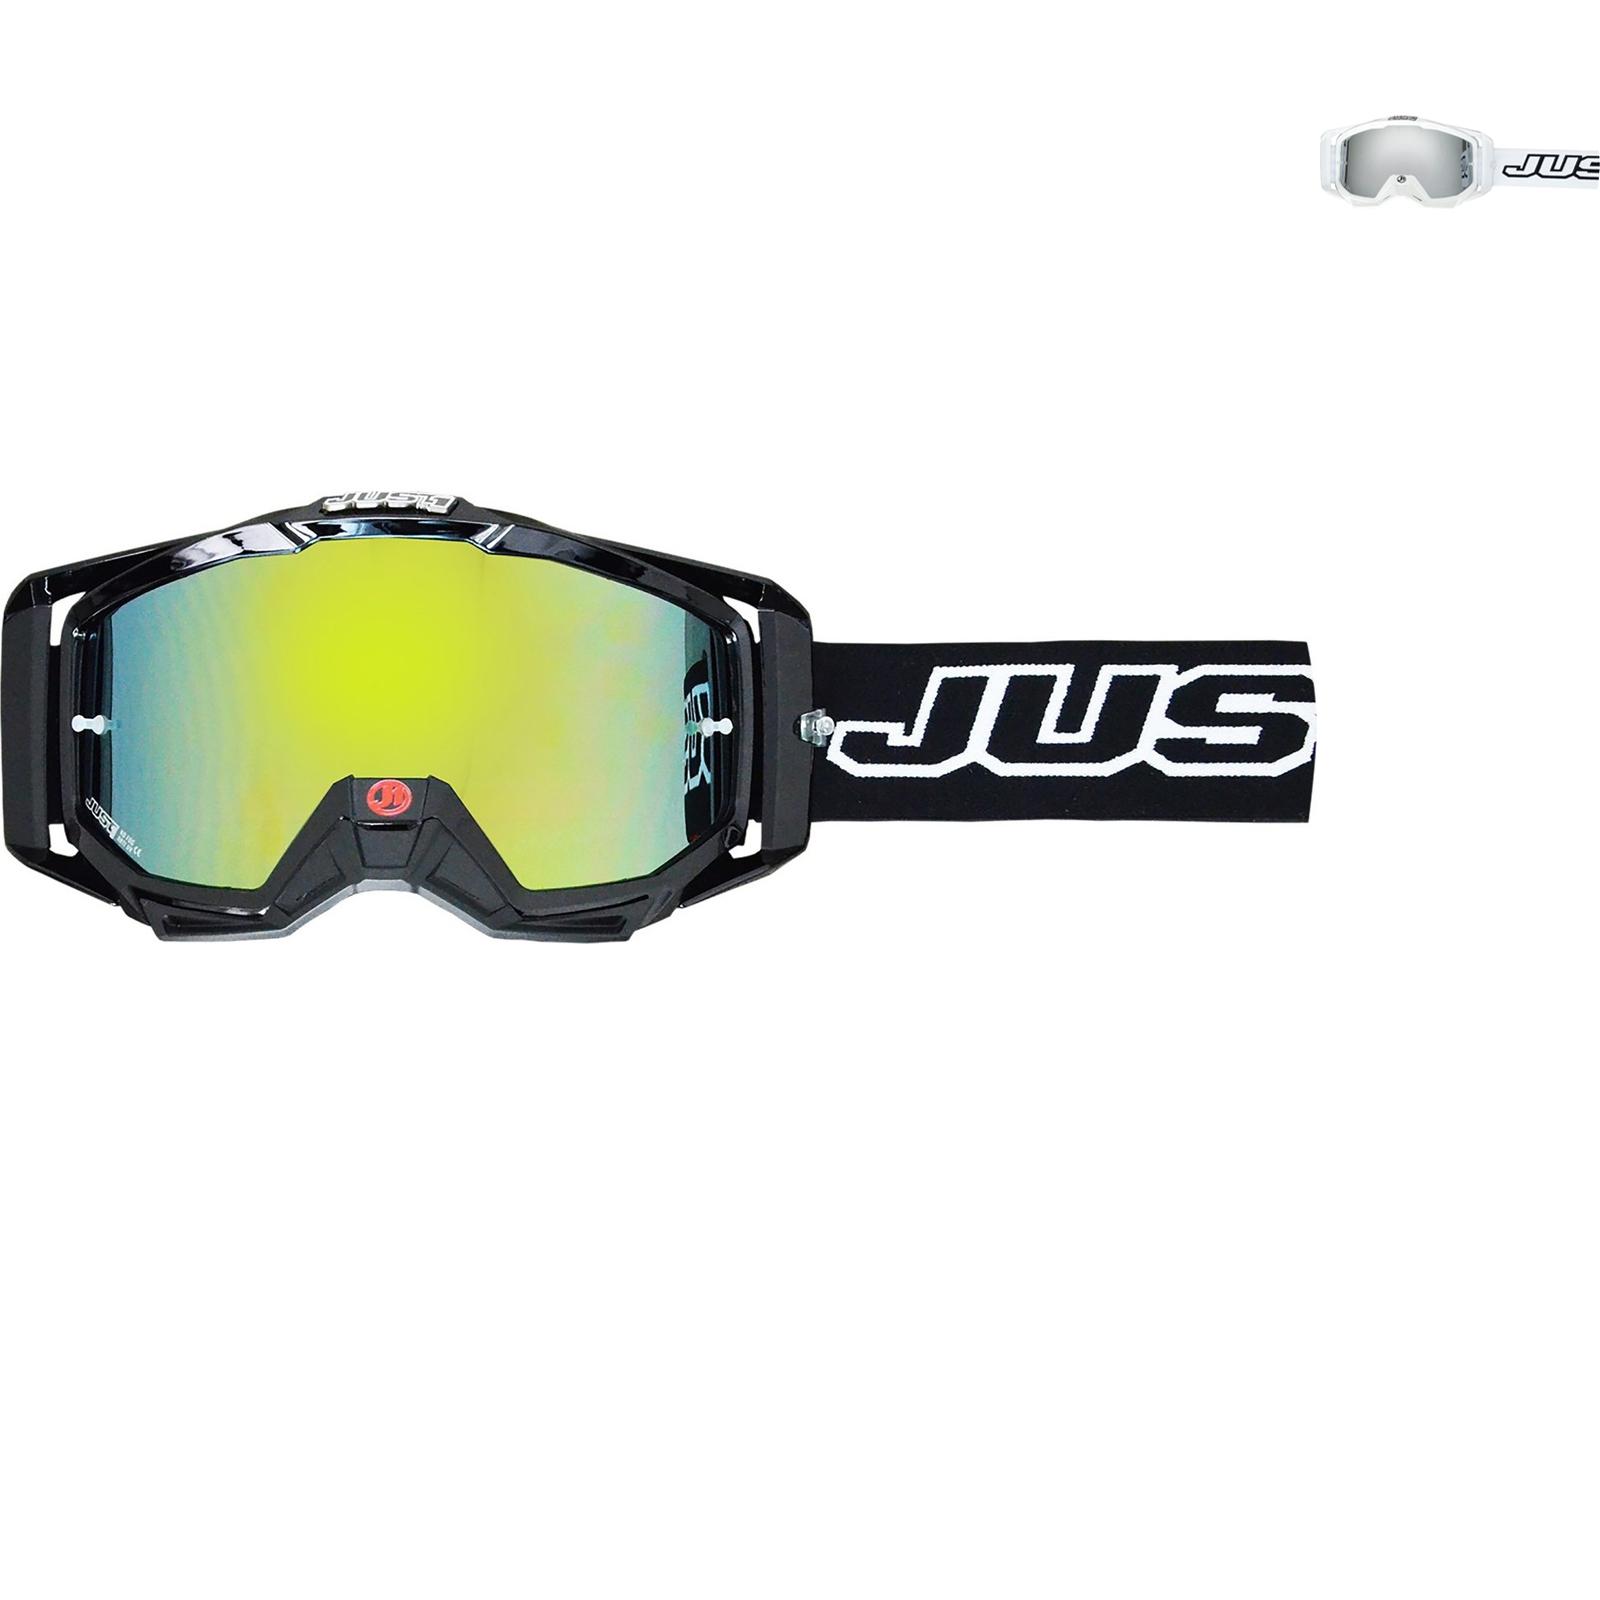 0a2a6cdbbf8e Just1 Iris Solid Motocross Goggles Enduro Dirt Bike Eyewear Anti ...